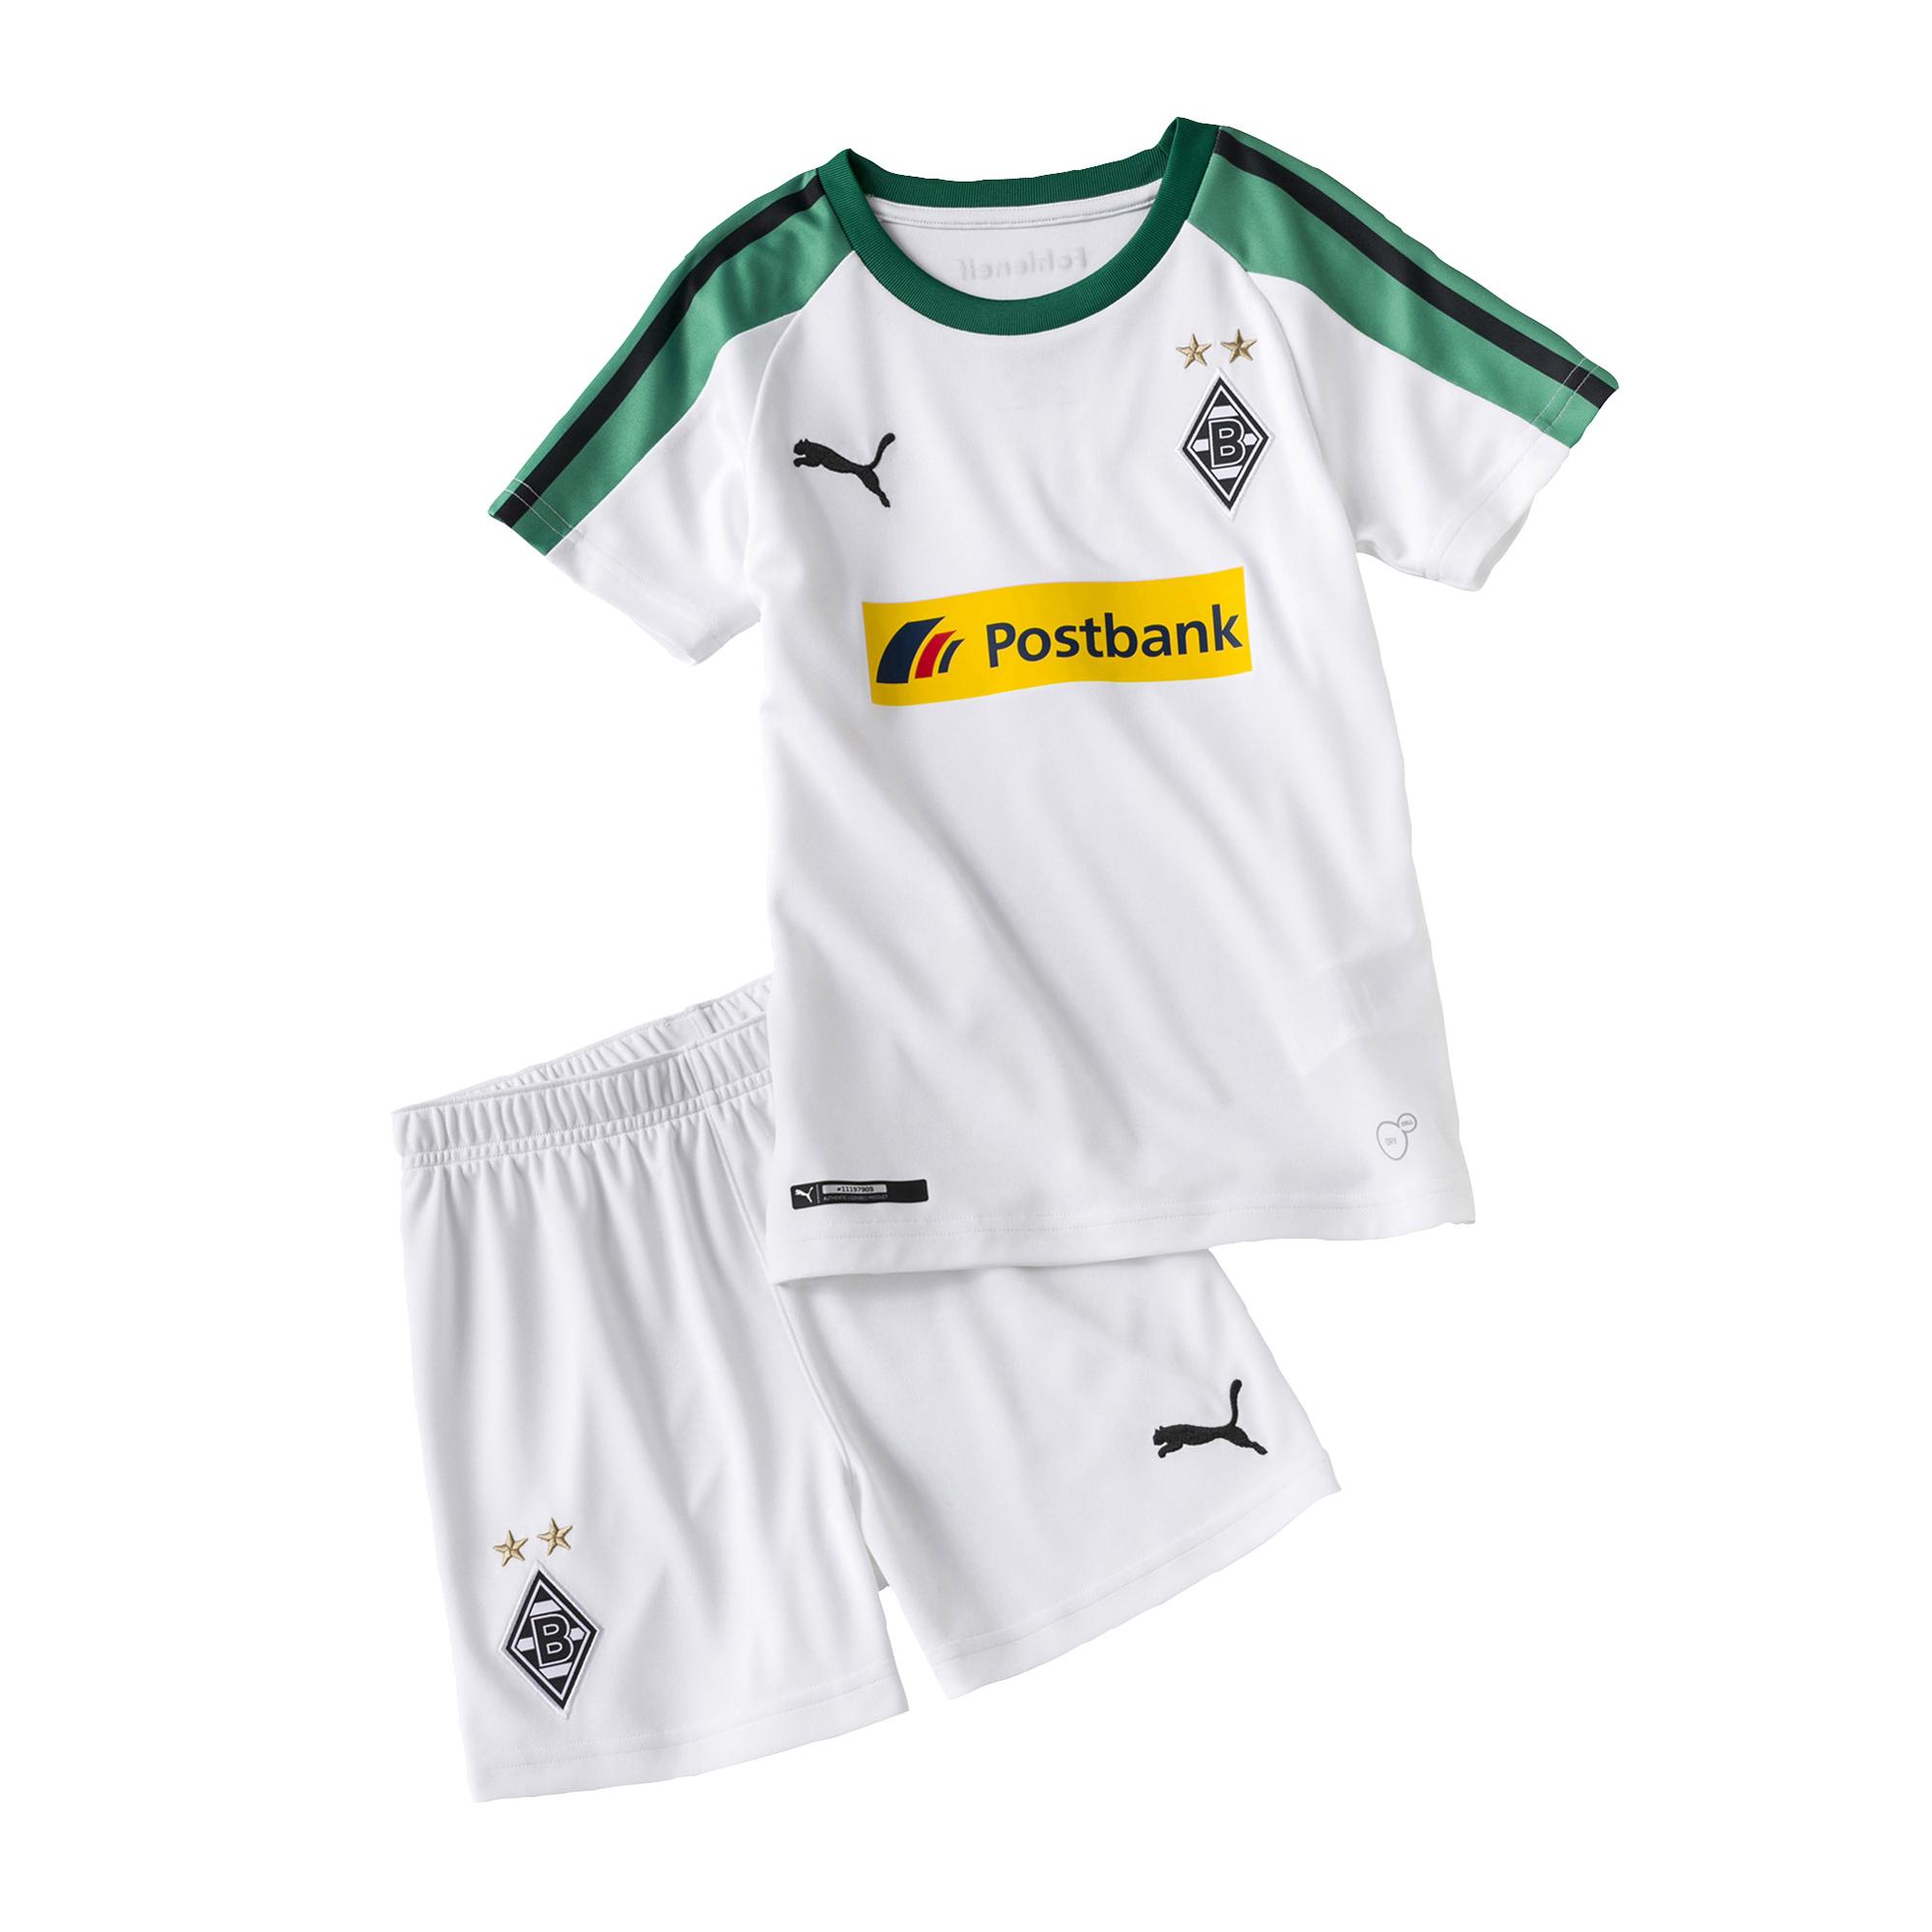 Puma Borussia Mönchengladbach - Kinder Home Minikit 18 19 - 753455-01 001 129ea4758